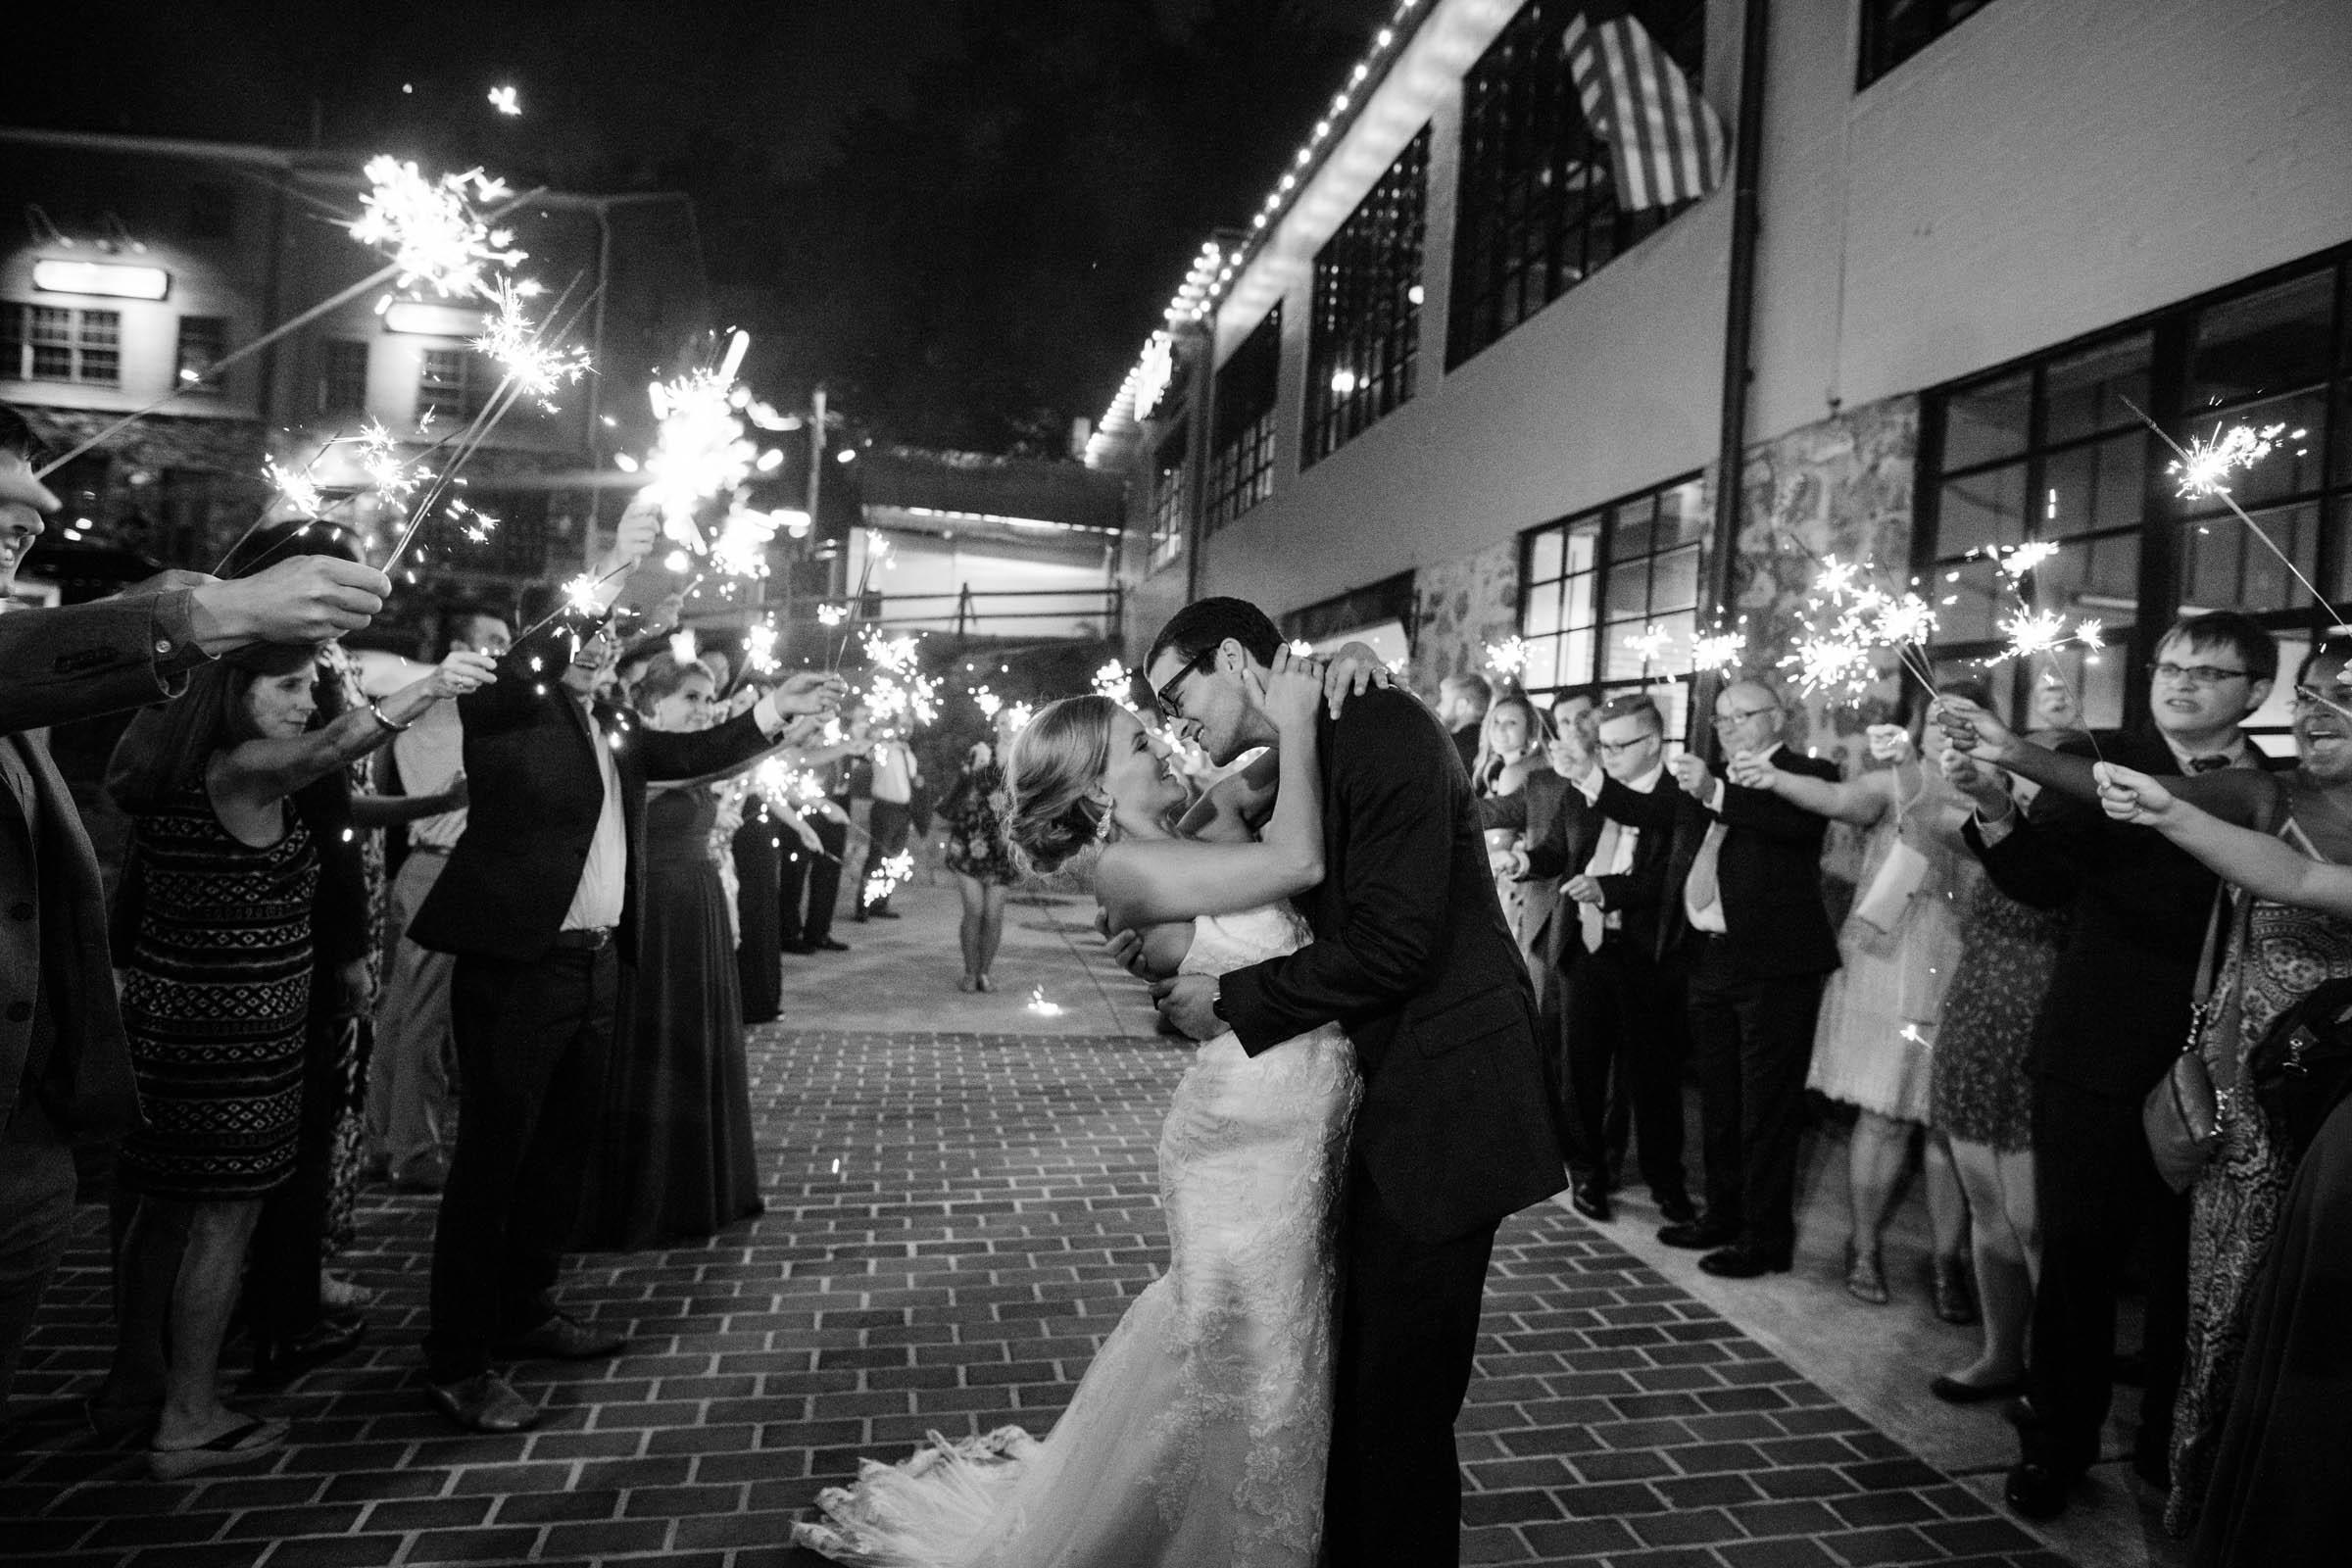 Ellicott City Wedding Photography by Megapixels Media Top Maryland Wedding Photographer sparkler send off.jpg